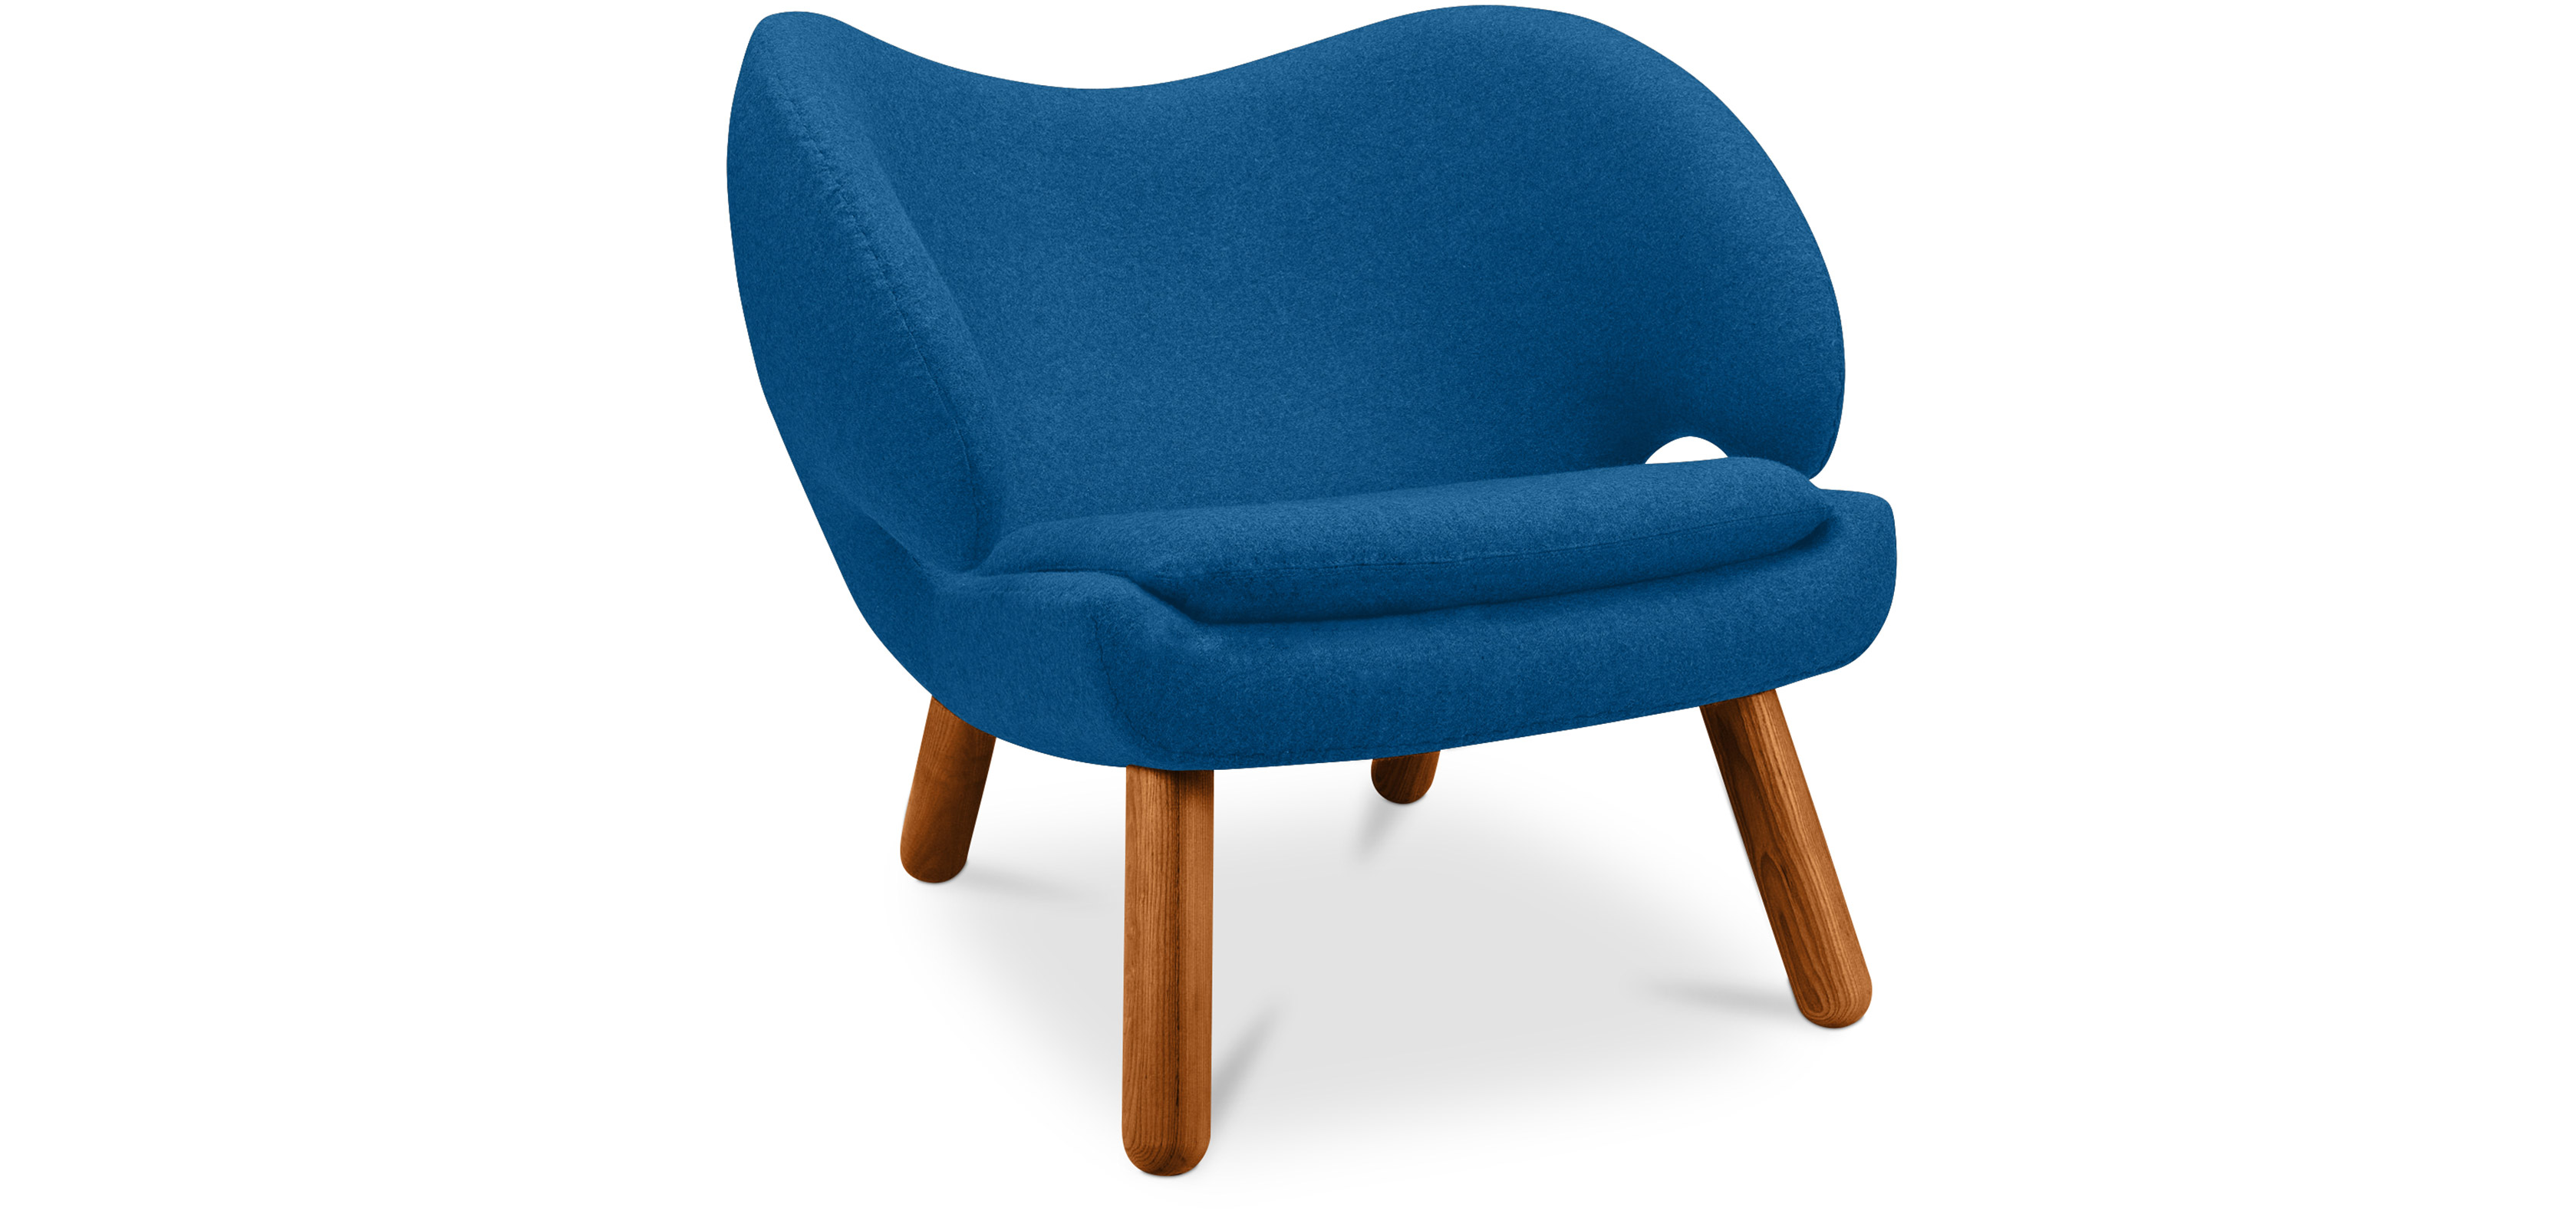 Paloma Skandinavisches Design Sessel - Stoff